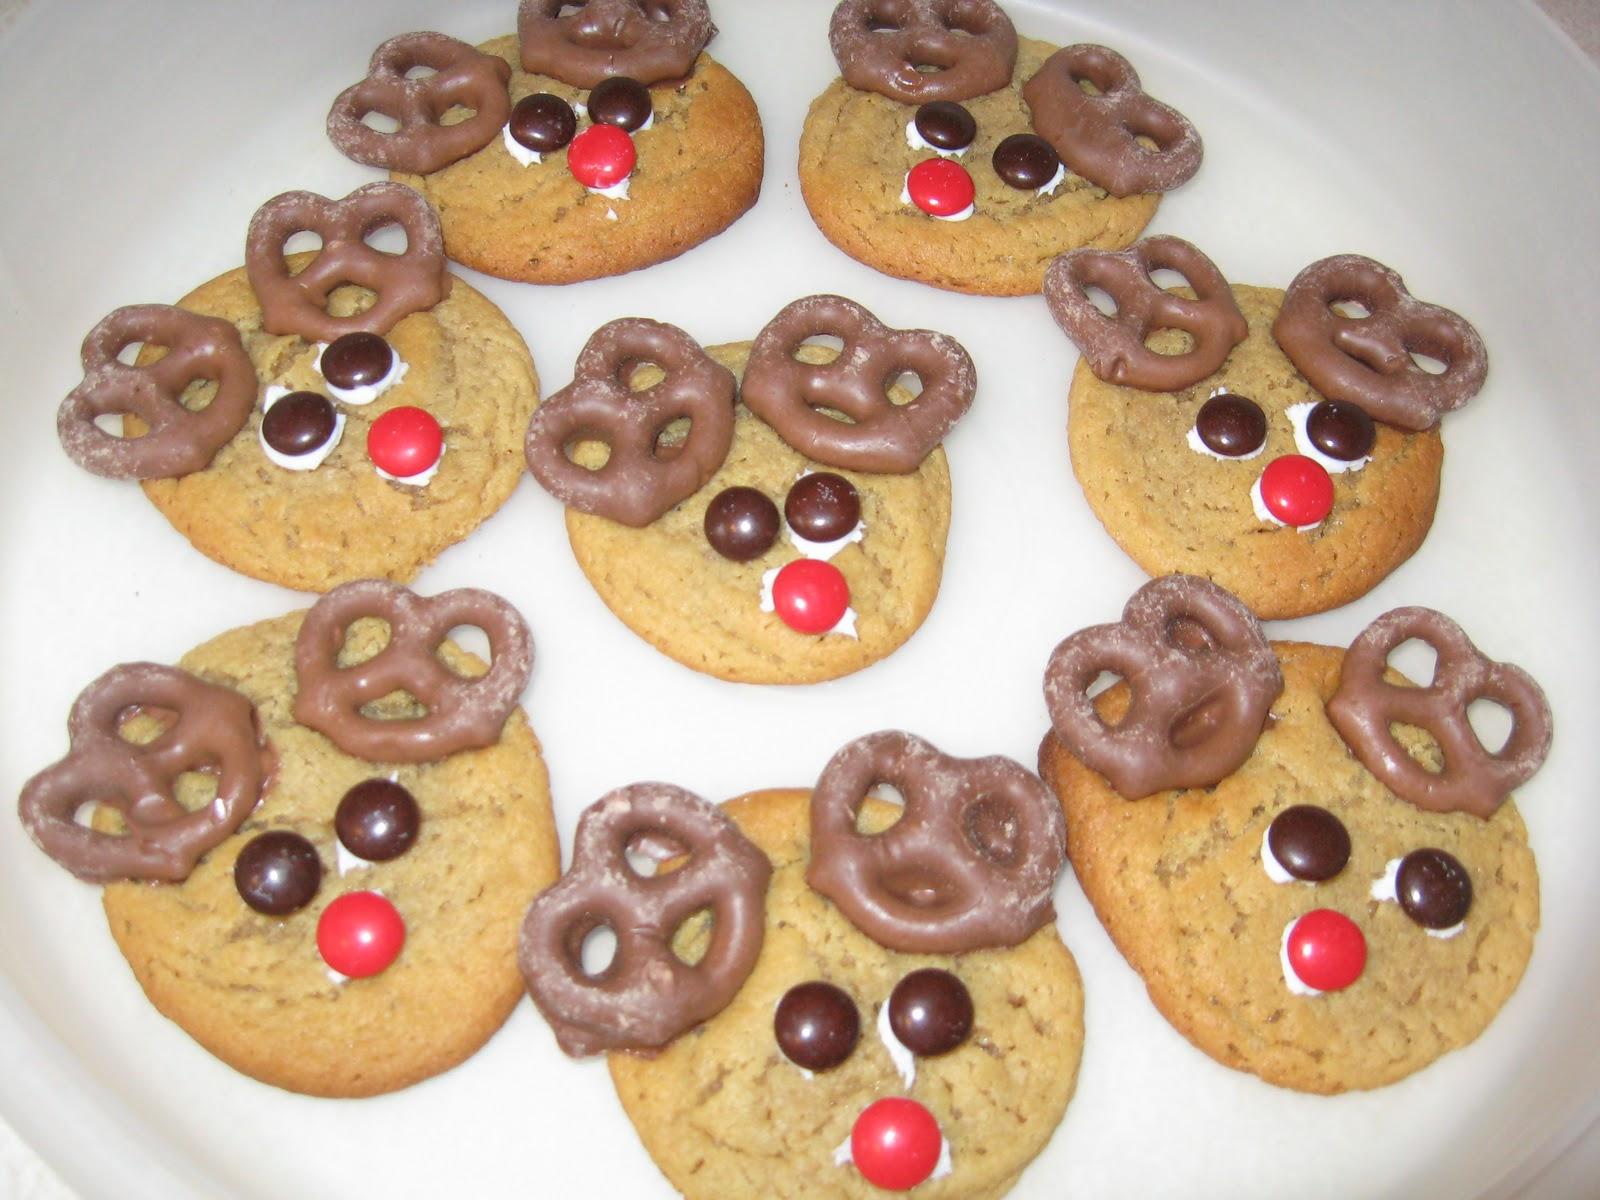 Christmas Cookie Recipes Easy.Christmas Cookie Recipes Easyraparperisydan